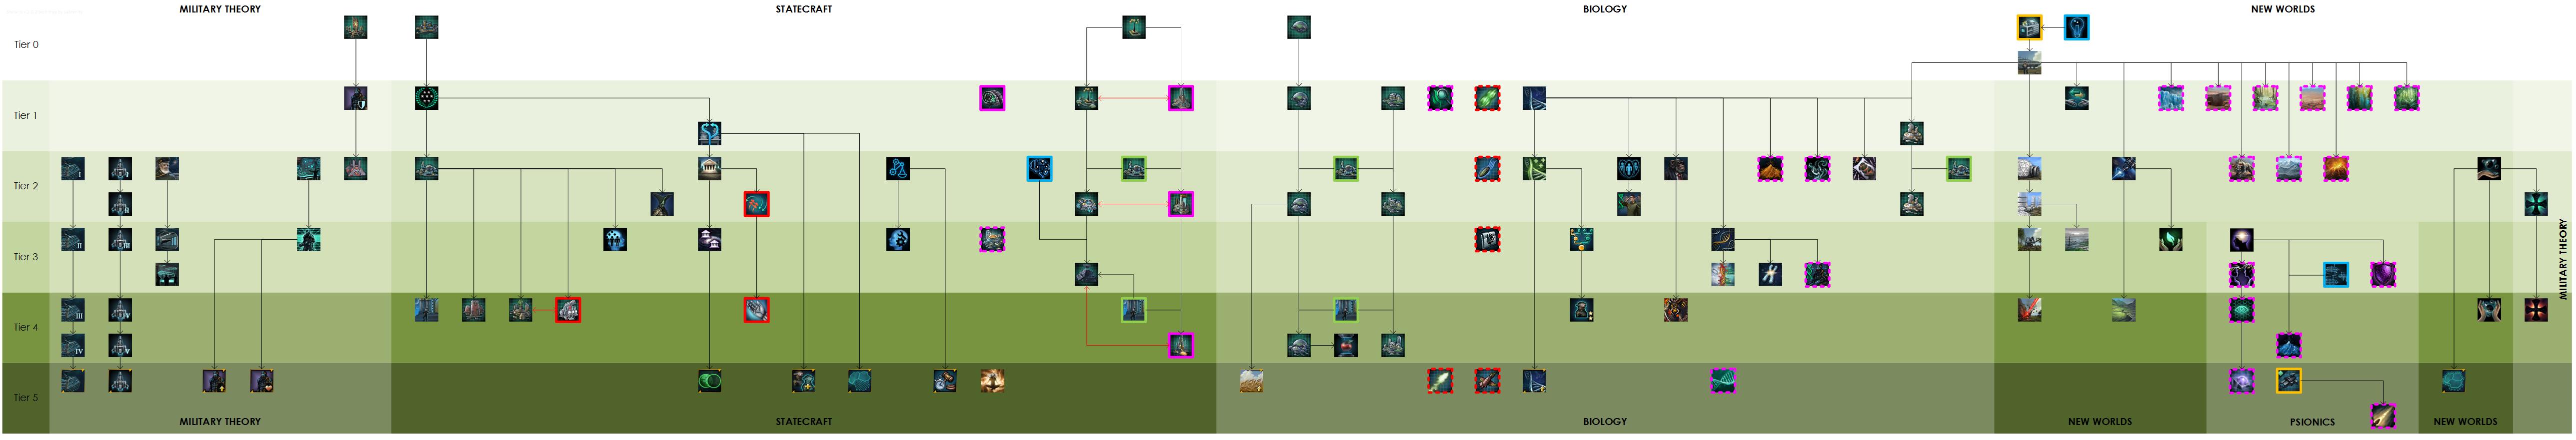 stellaris-tech-tree-s.png